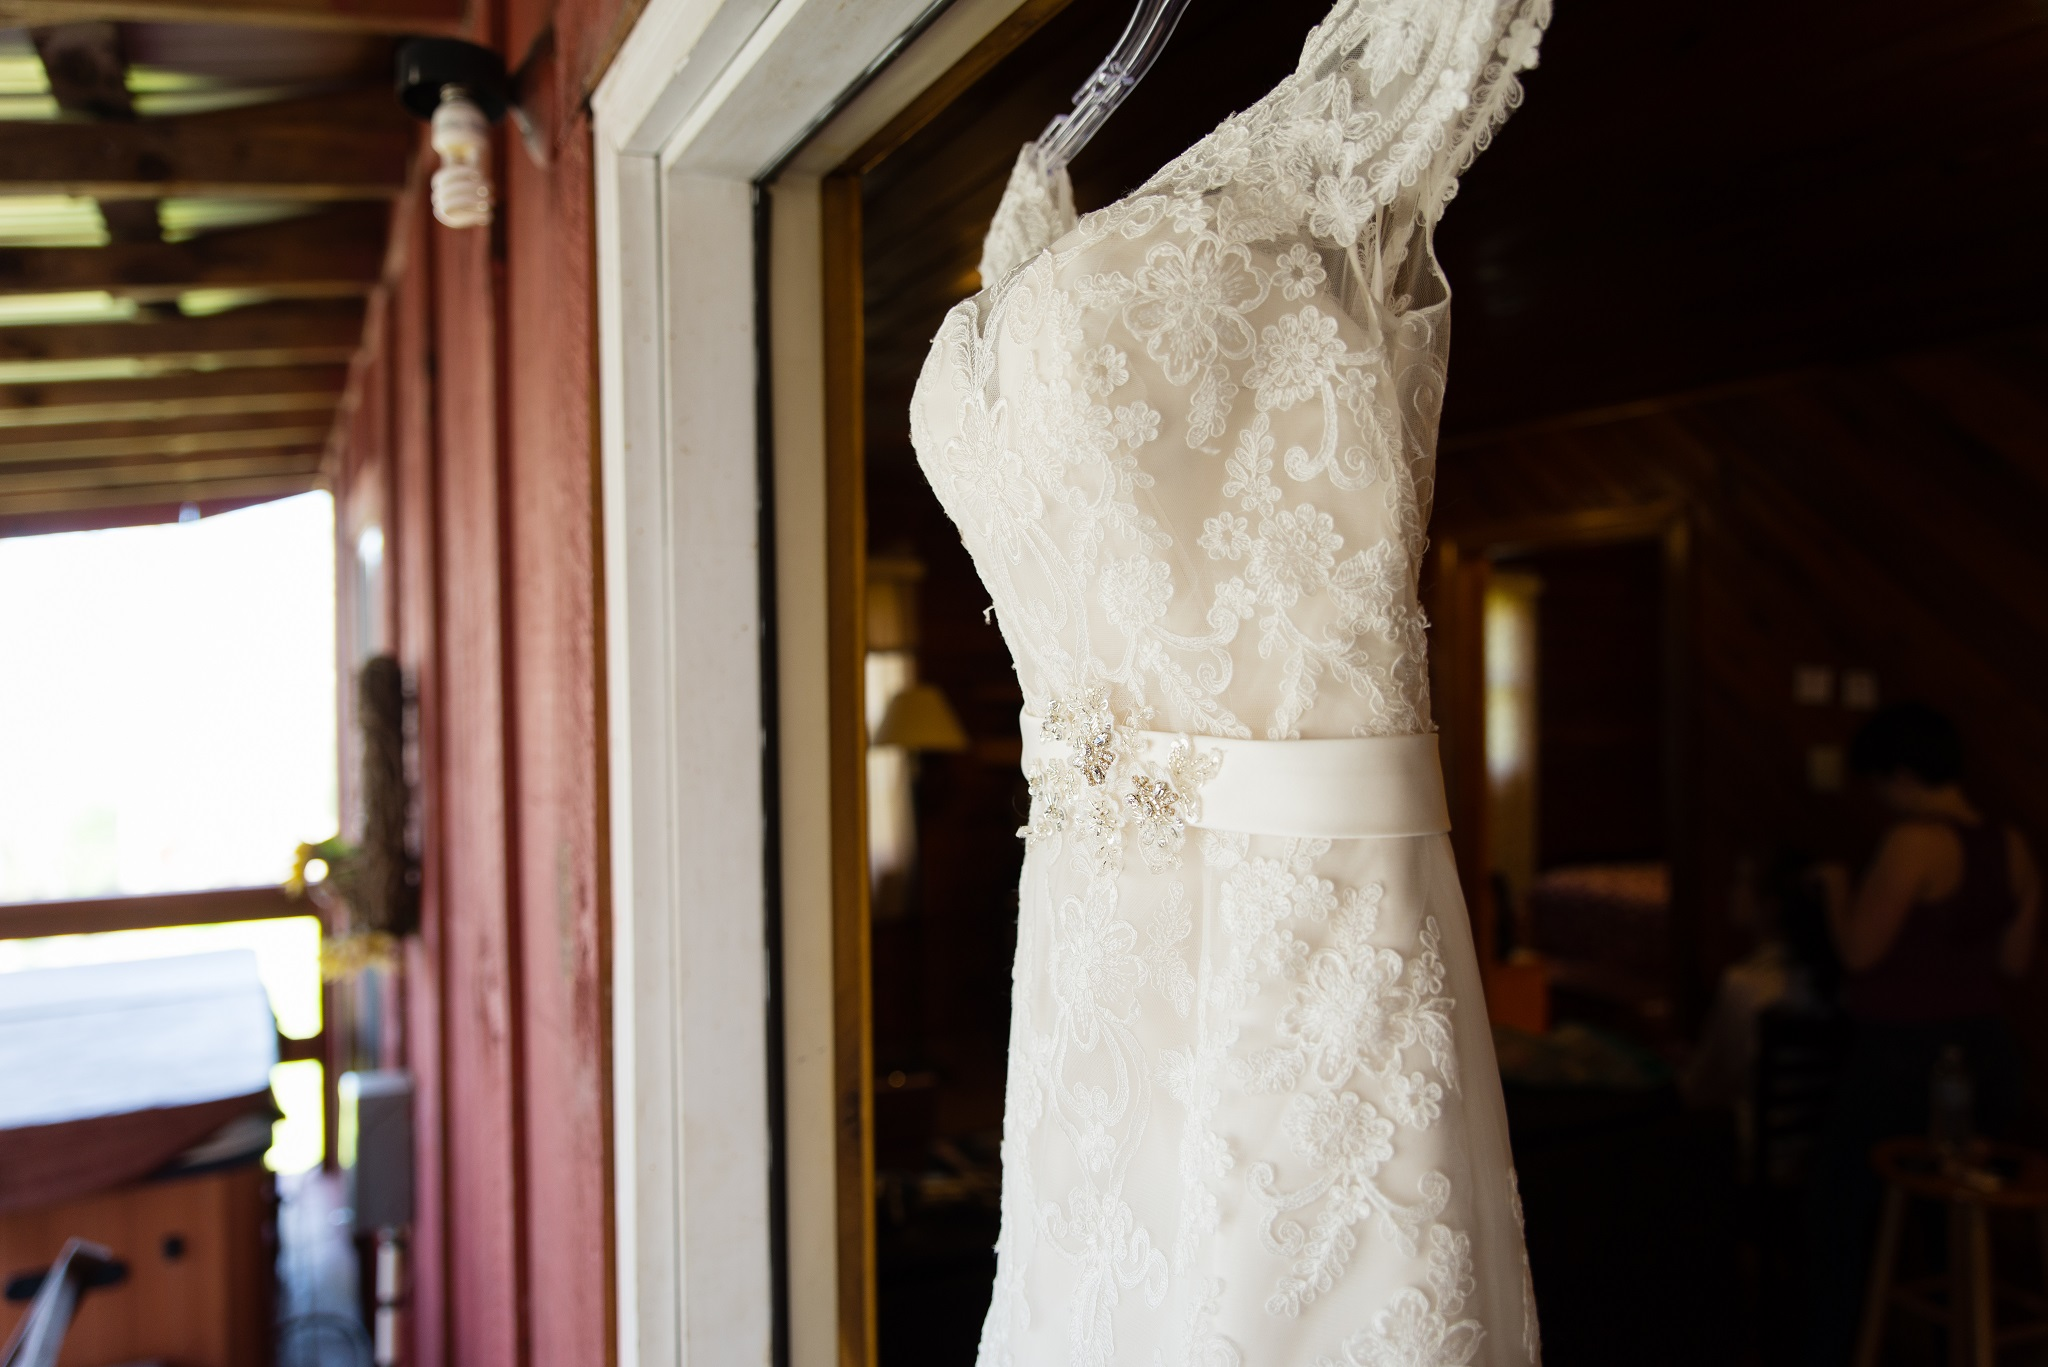 wedding dress, details, Campton KY wedding, rrg wedding, Red River Gorge, outdoor wedding, kentucky wedding, ky wedding photographer